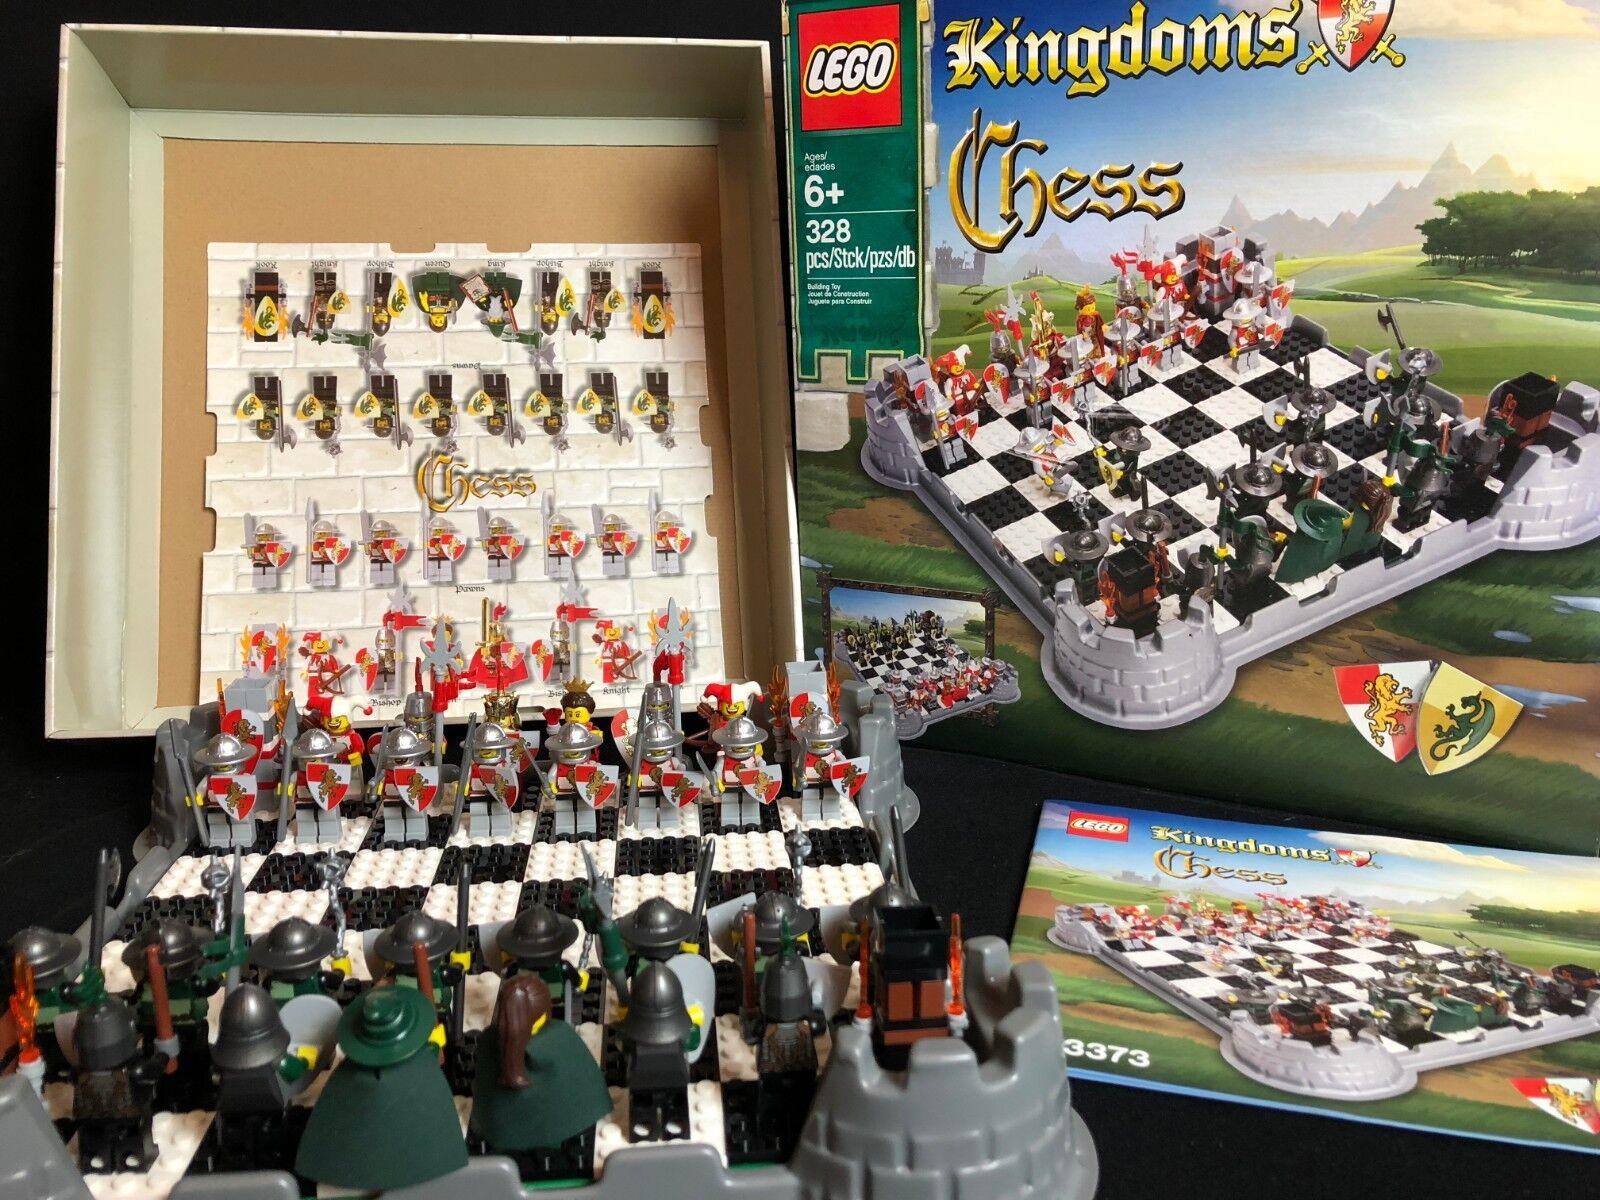 LEGO 853373 Kingdoms Chess Kingdoms Chess Set